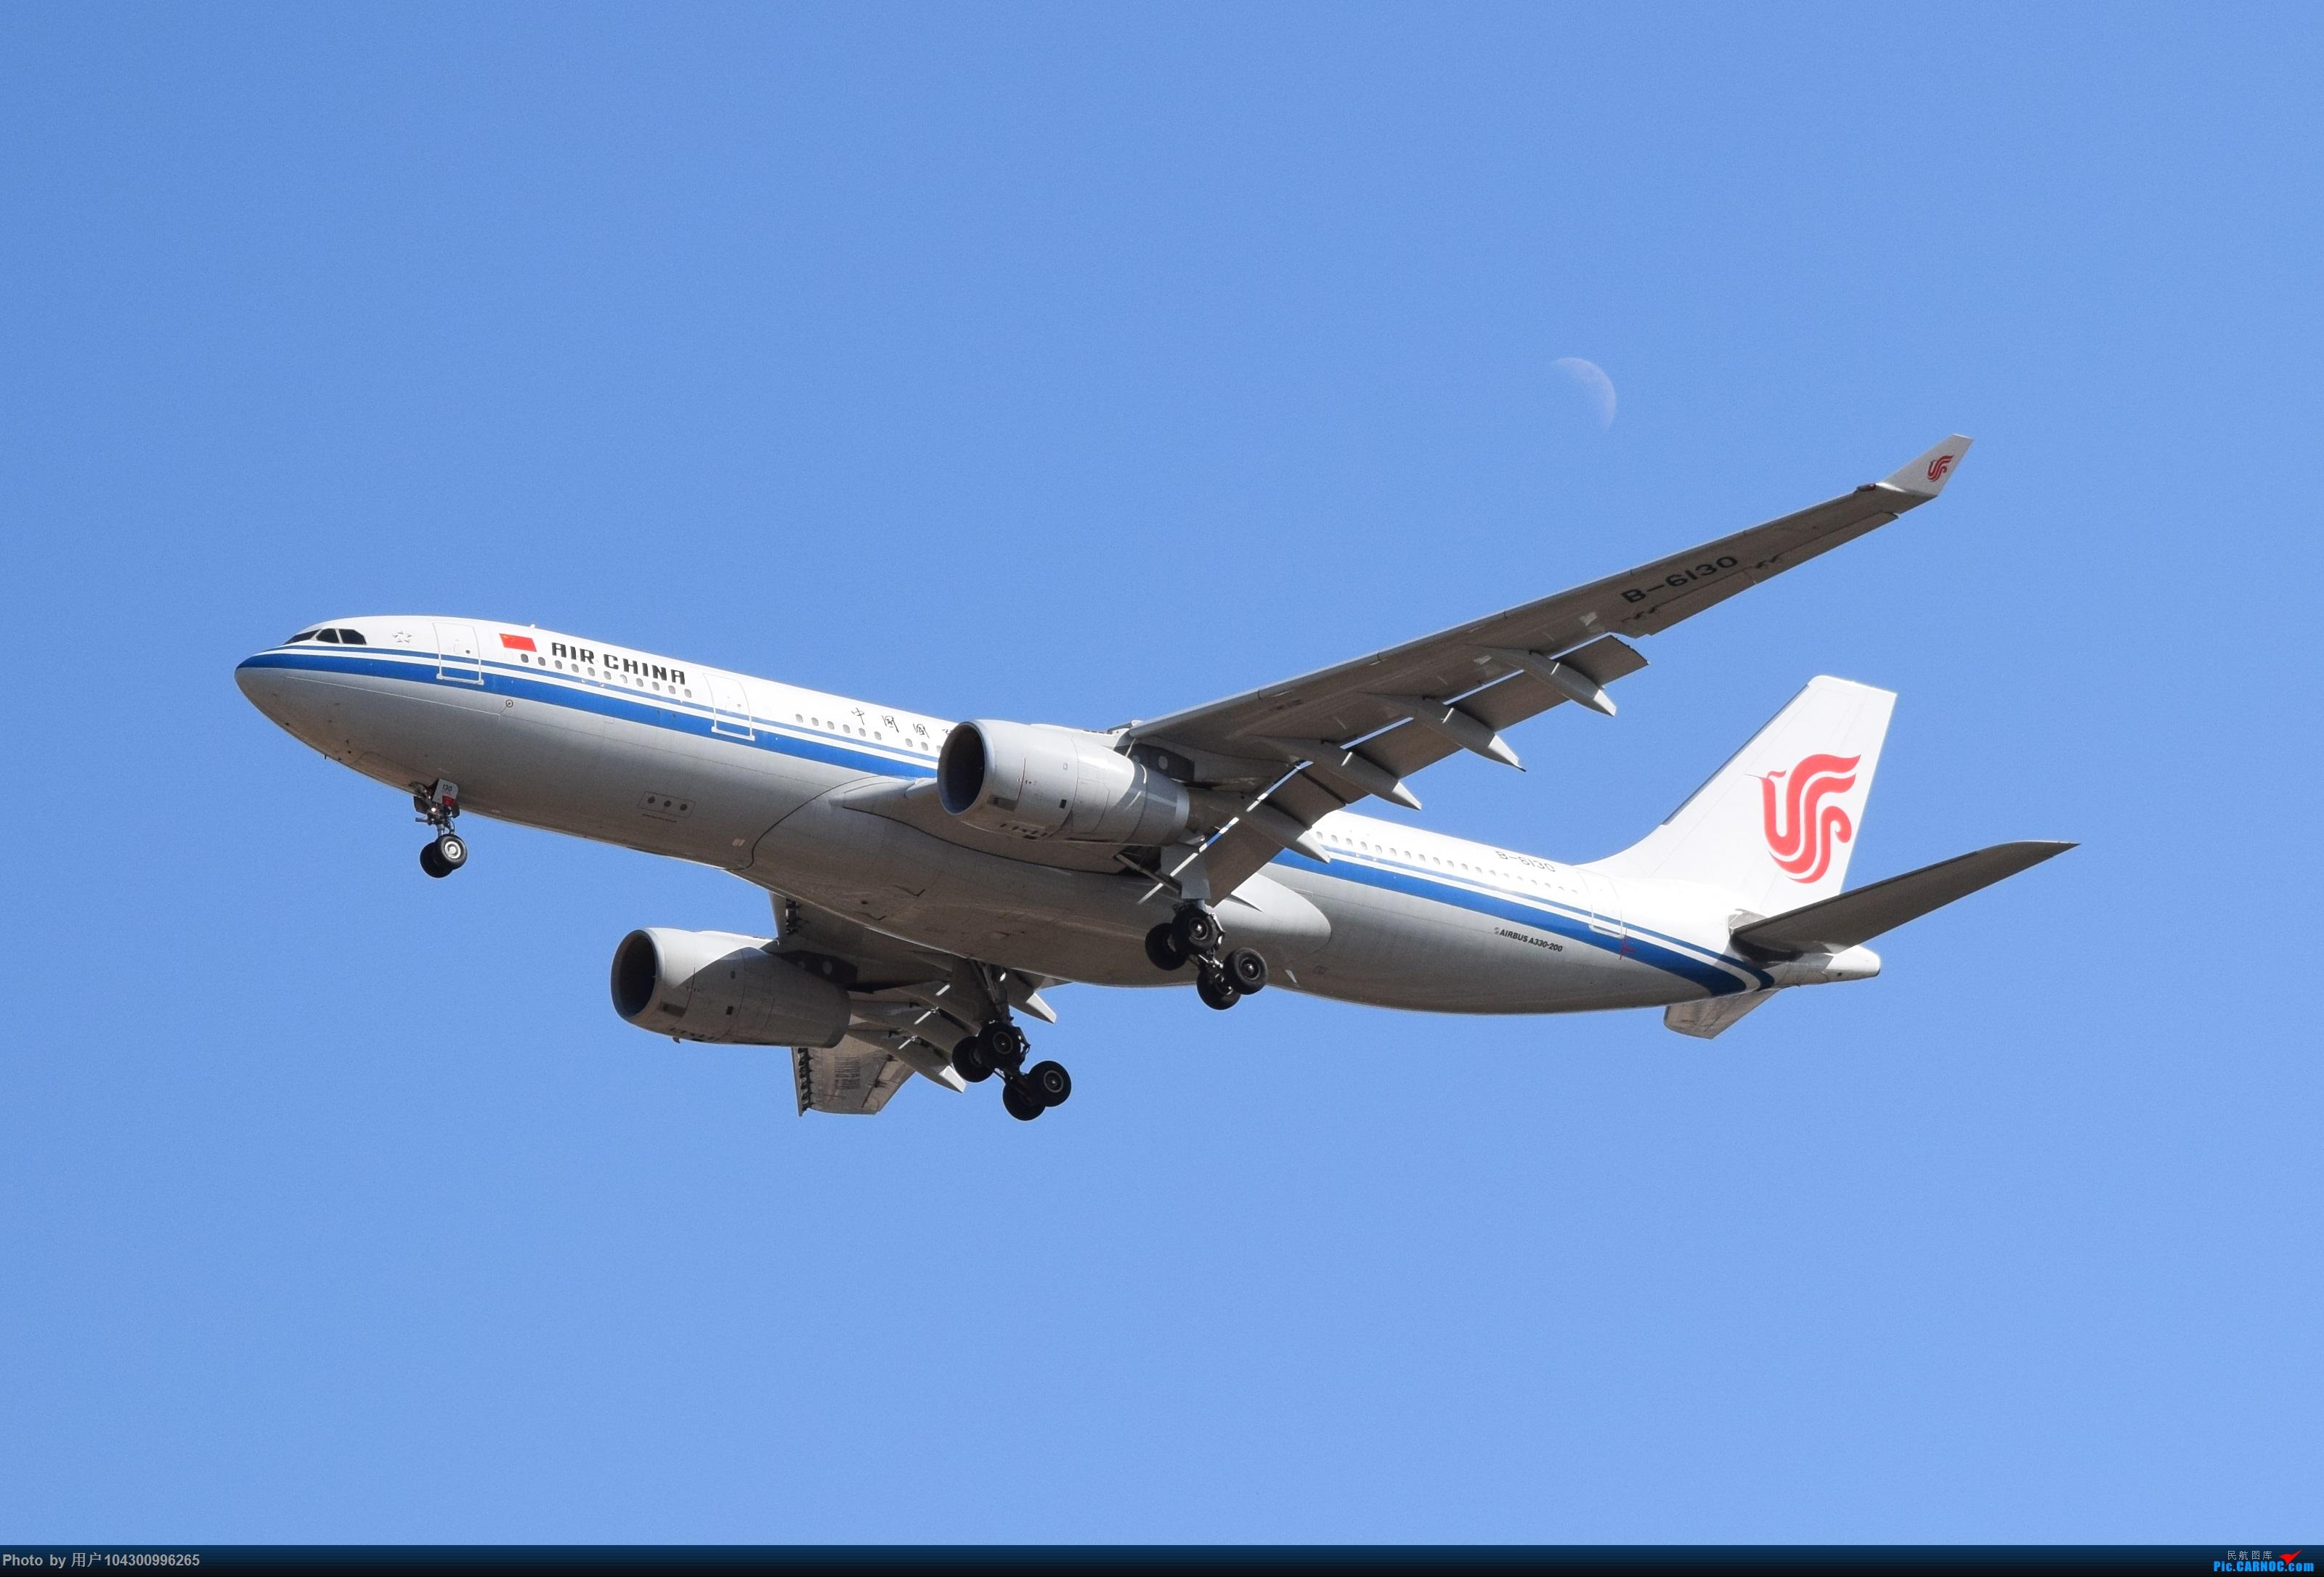 Re:[原创][KWE]贵阳今天天气不错,随便拍几张! AIRBUS A330-200 B-6130 中国贵阳龙洞堡国际机场